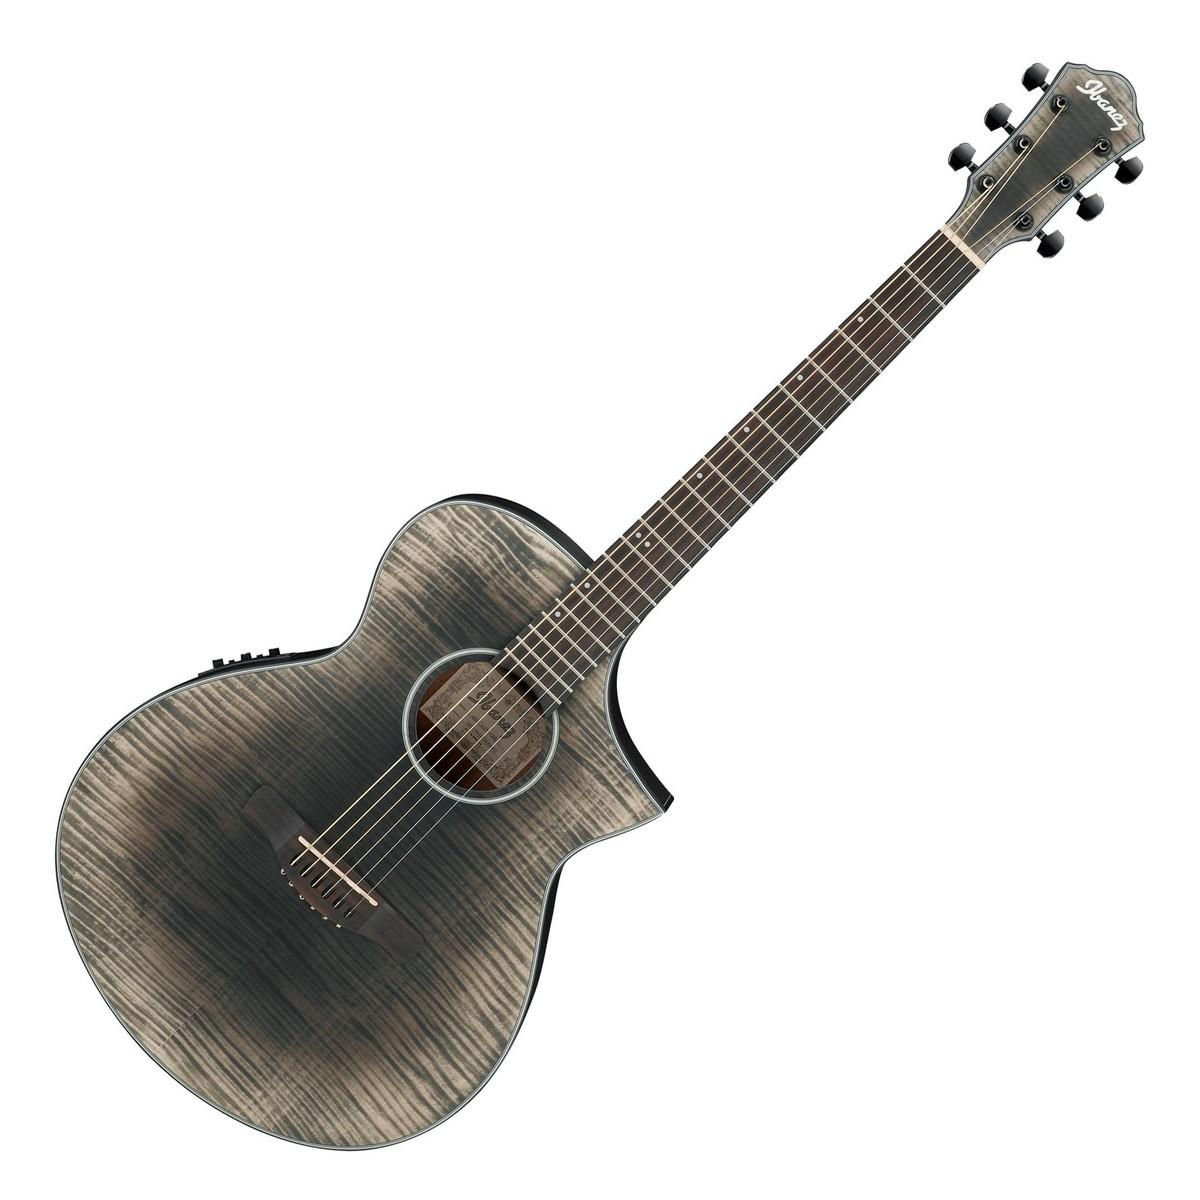 ibanez aewc32fm gbk thinline guitare electro acoustique. Black Bedroom Furniture Sets. Home Design Ideas